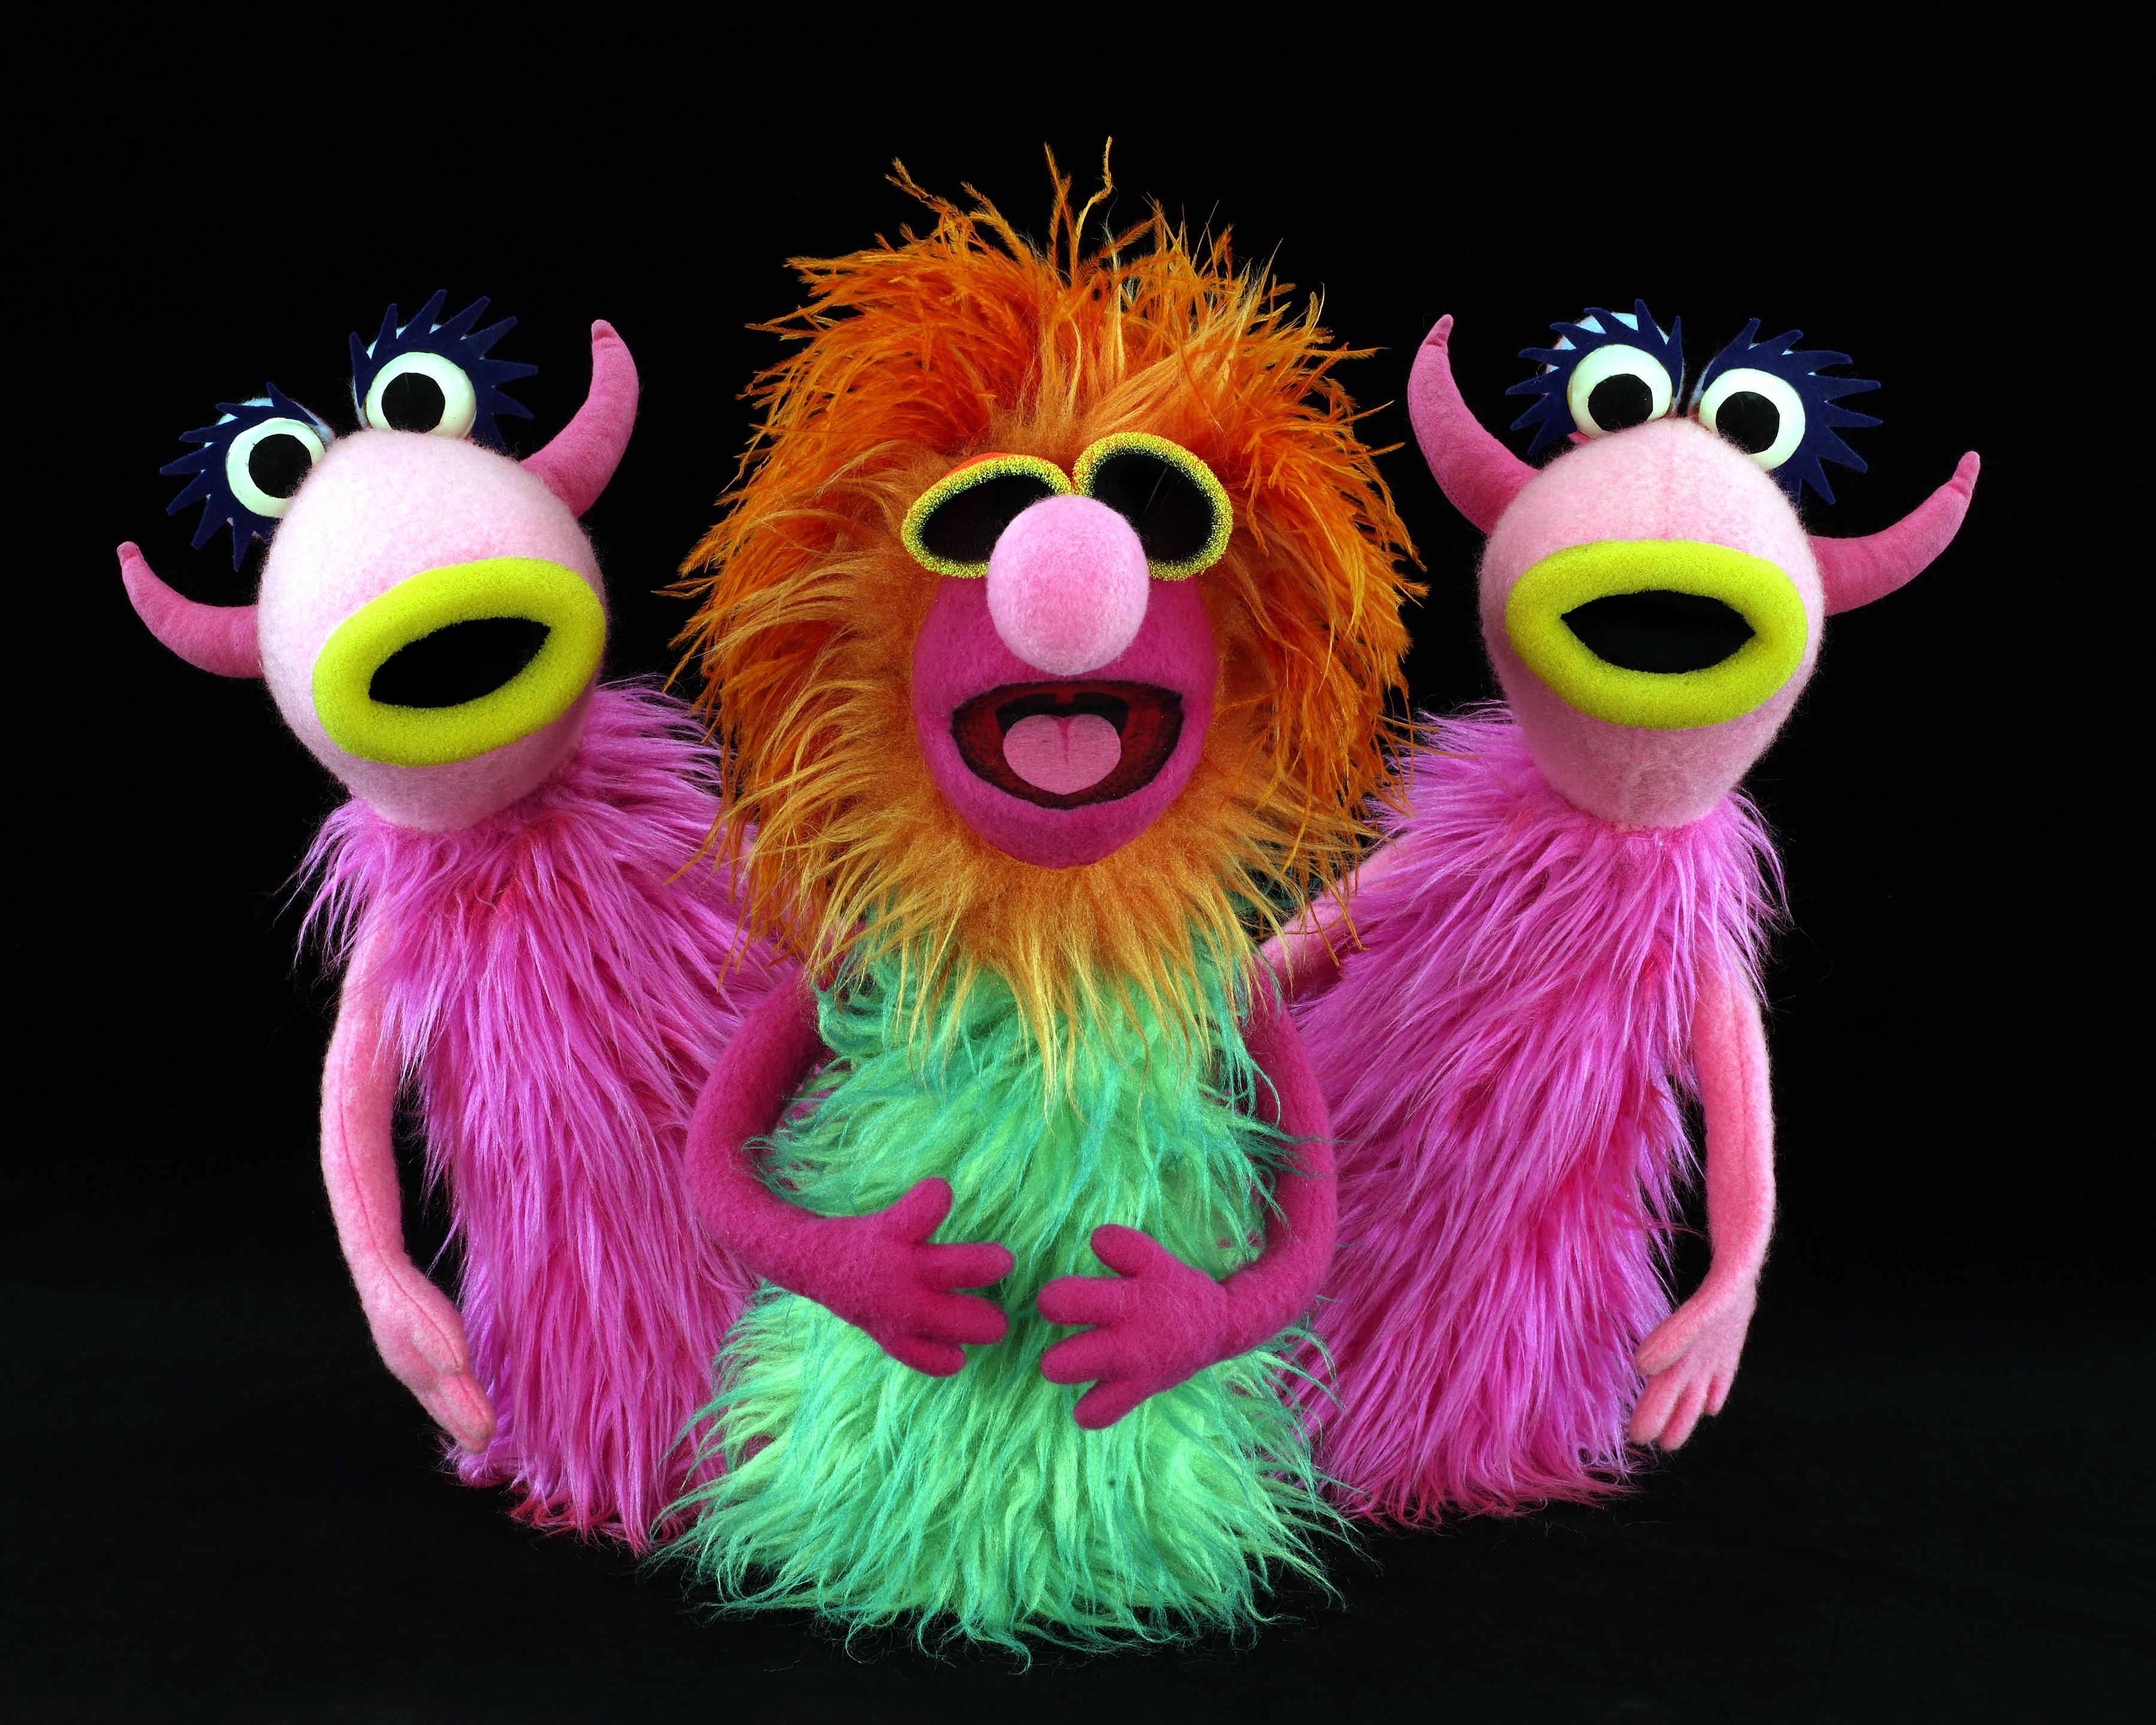 Mahna Mahna (character) | Muppet Wiki | Fandom powered by Wikia